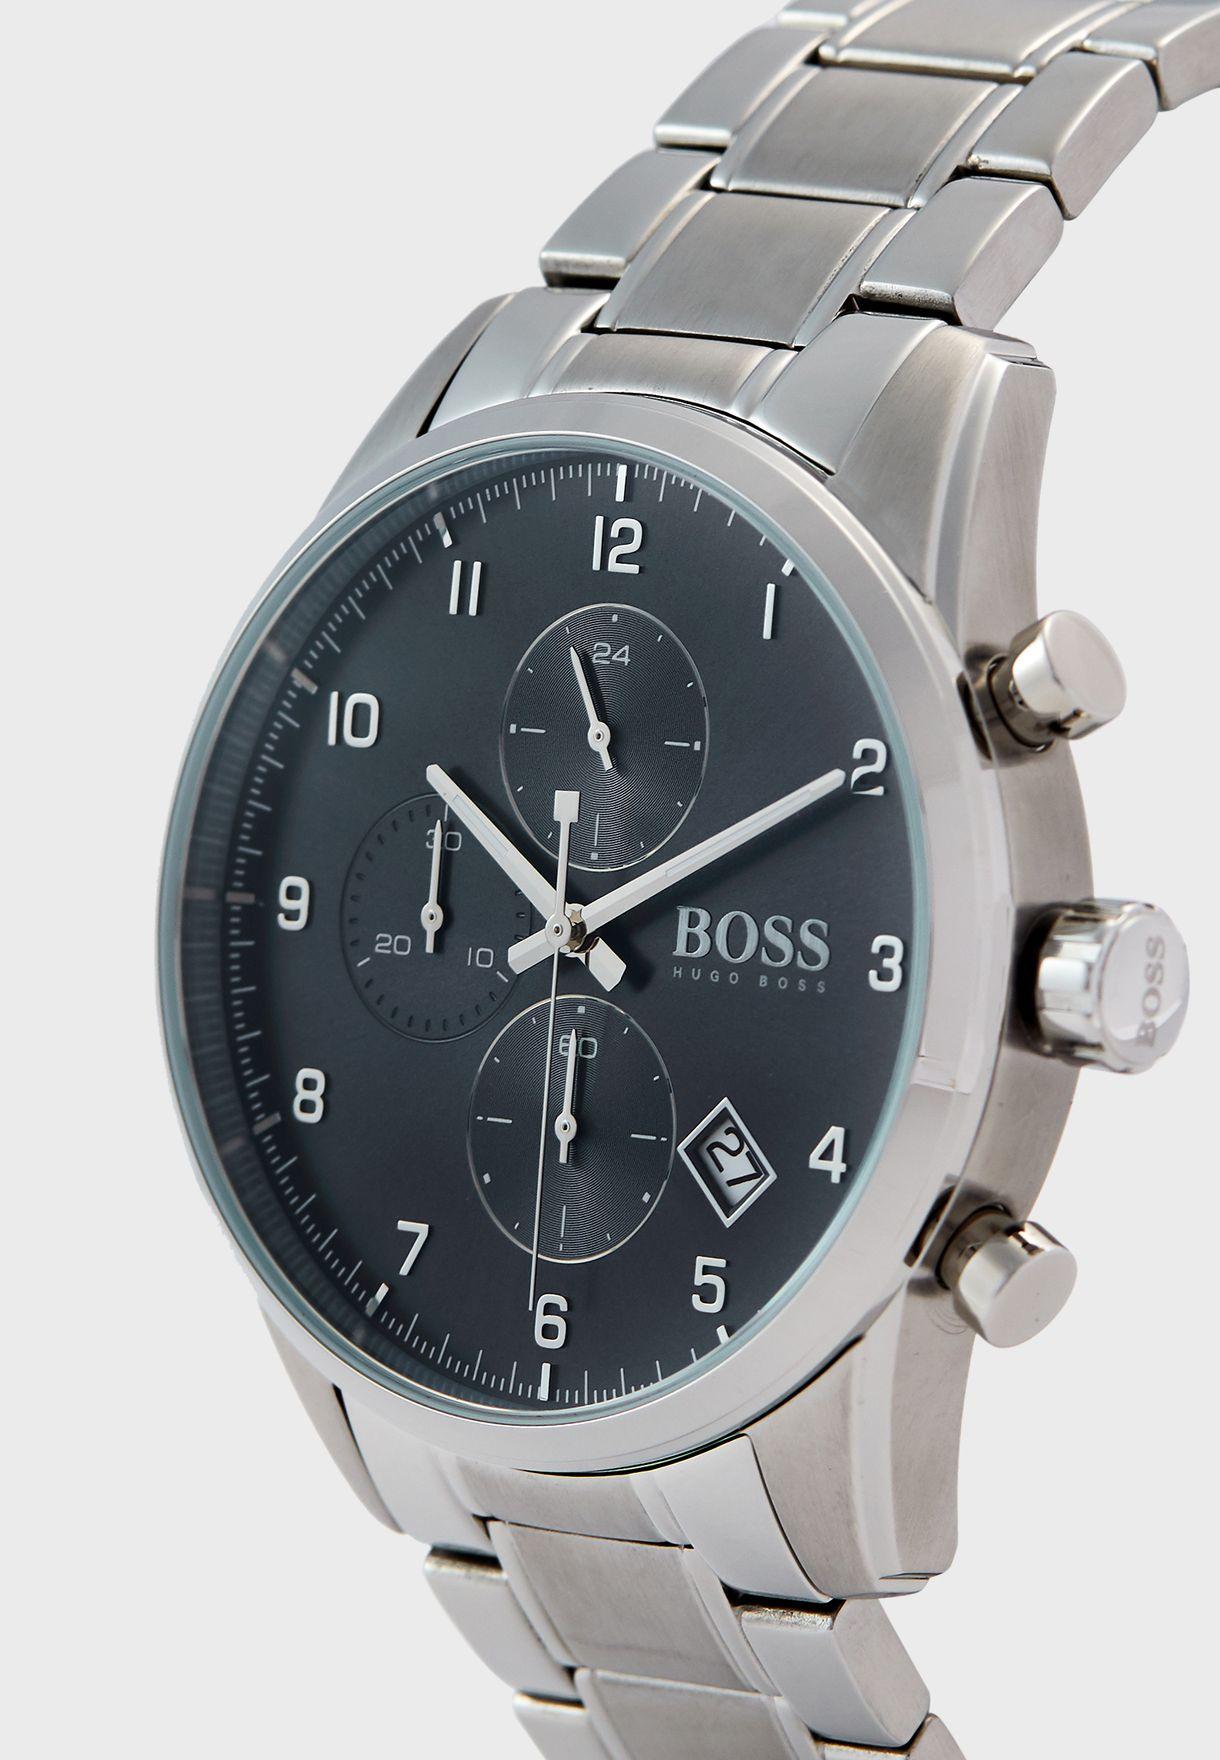 1513784 Skymaster Chronograph Watch